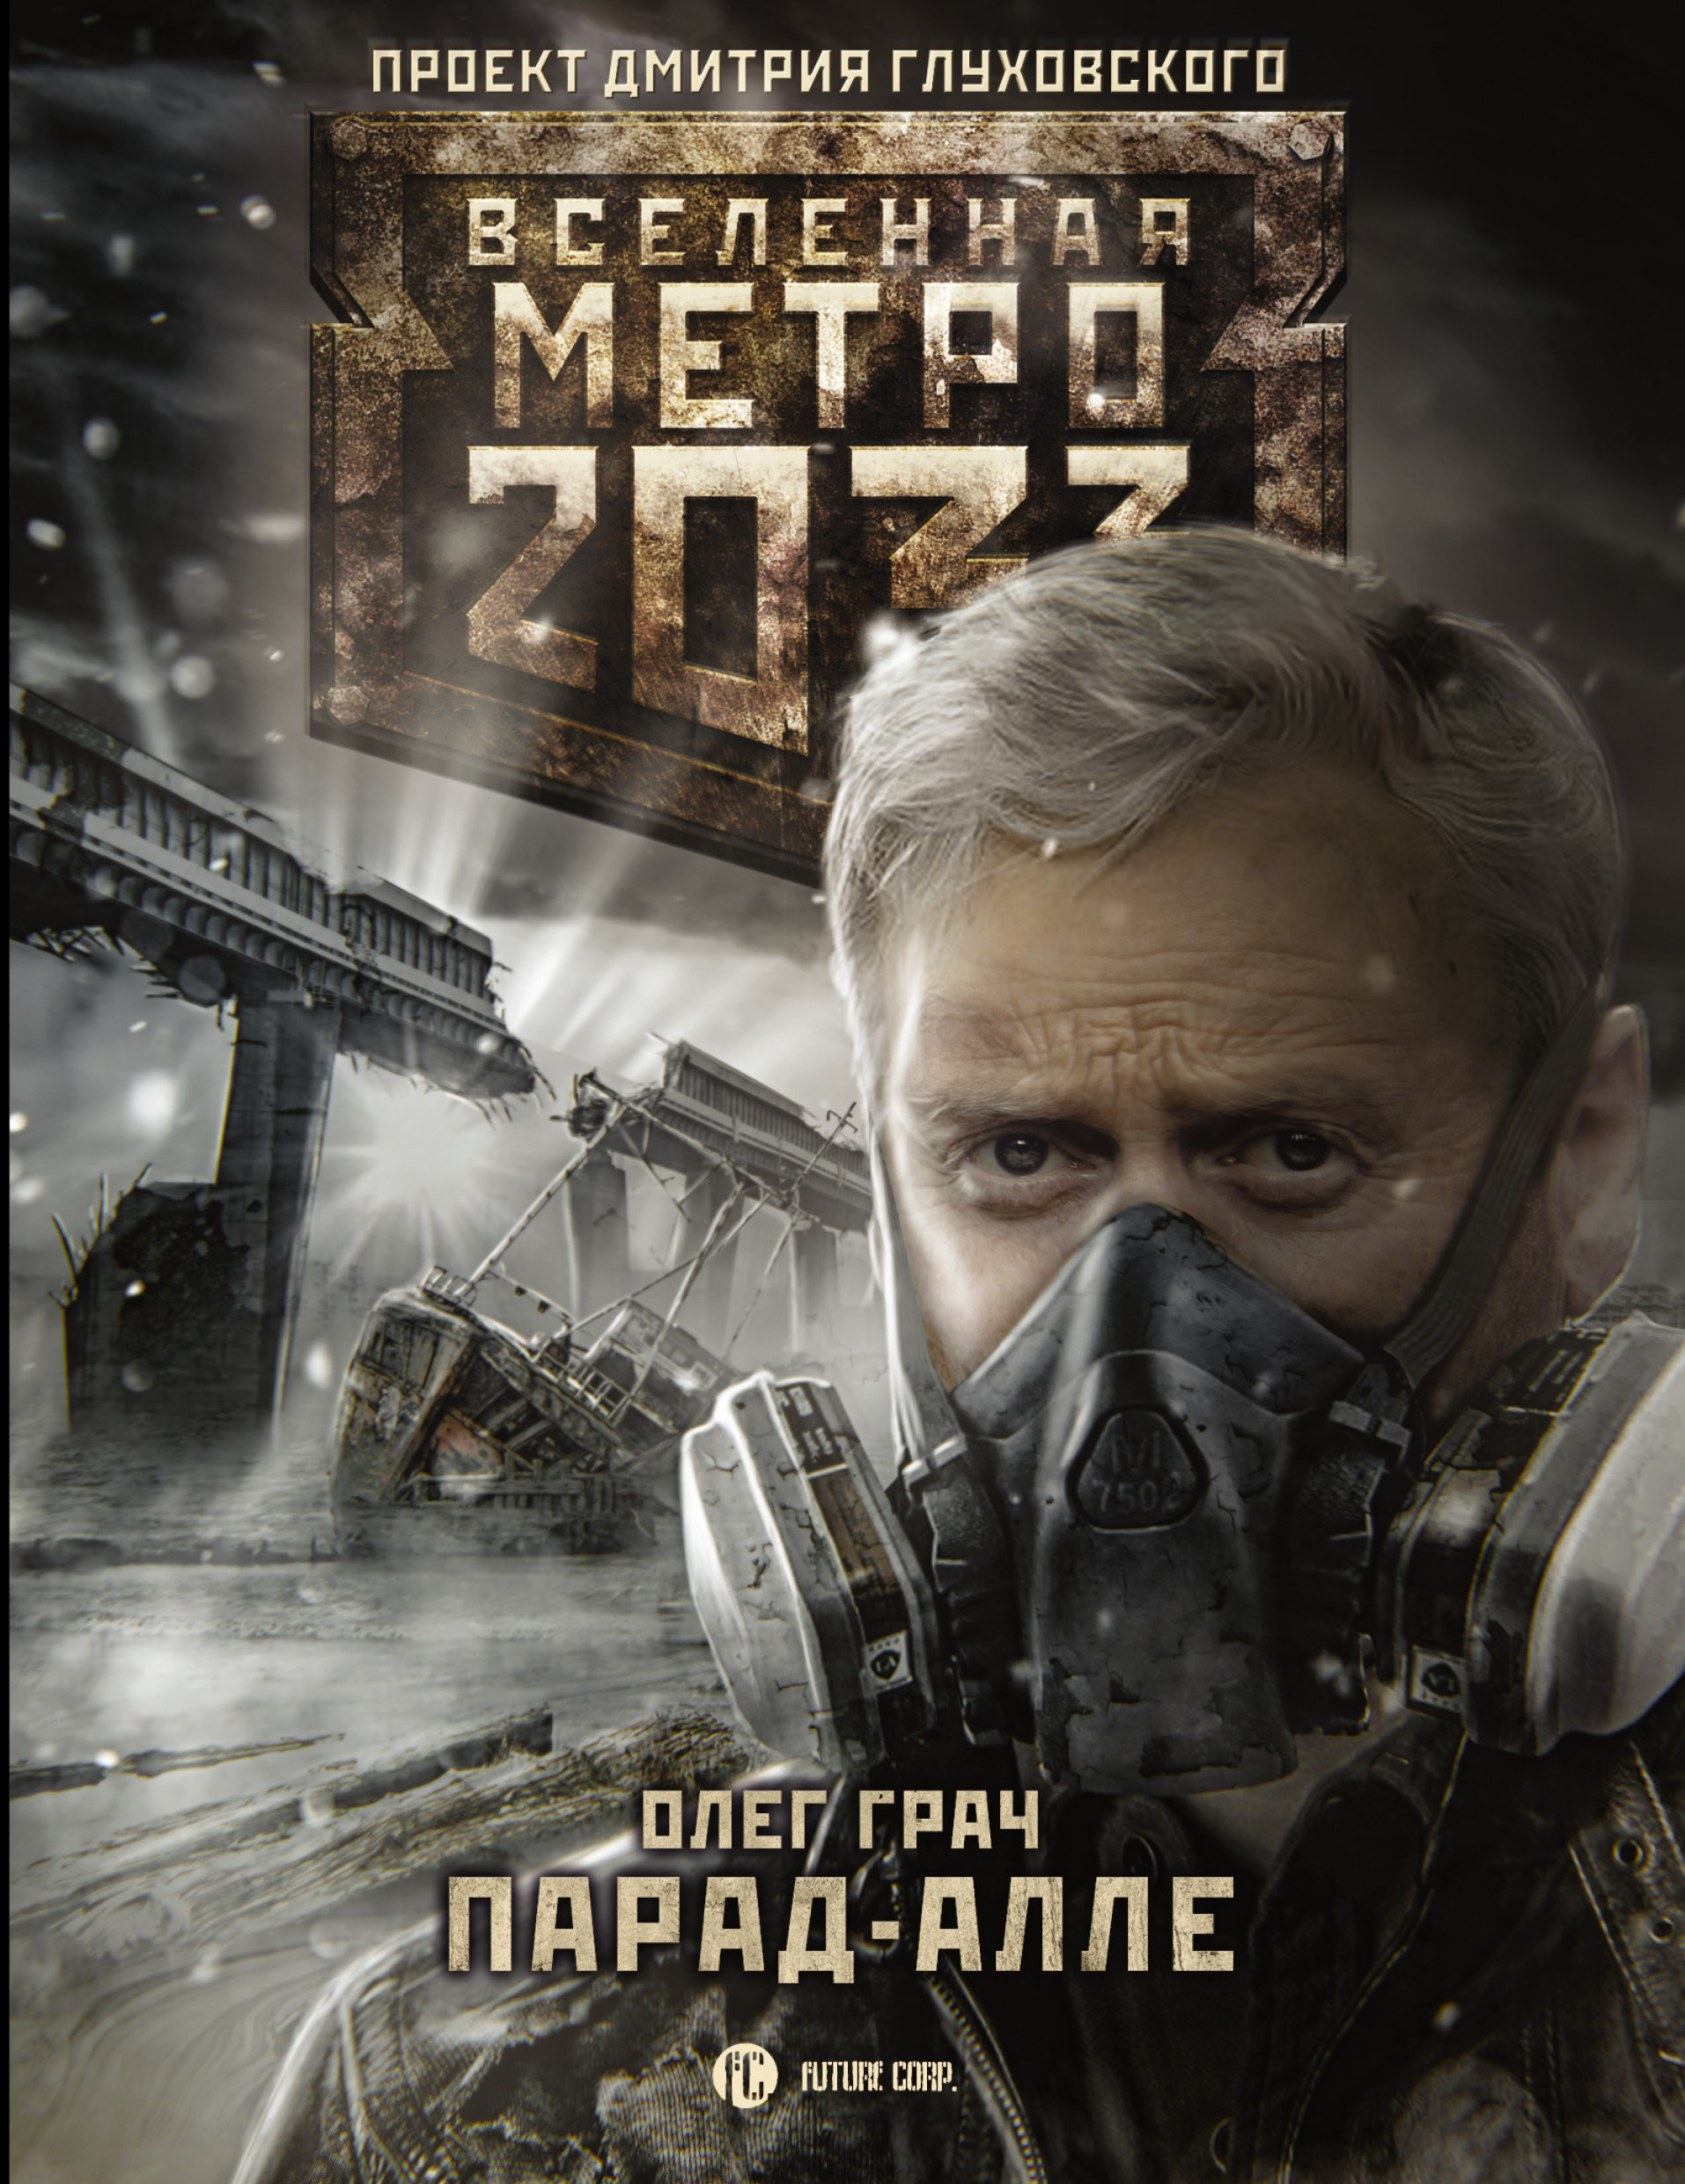 Олег Грач Метро 2033: Парад-алле уленгов ю метро 2033 грань человечности isbn 9785170979134